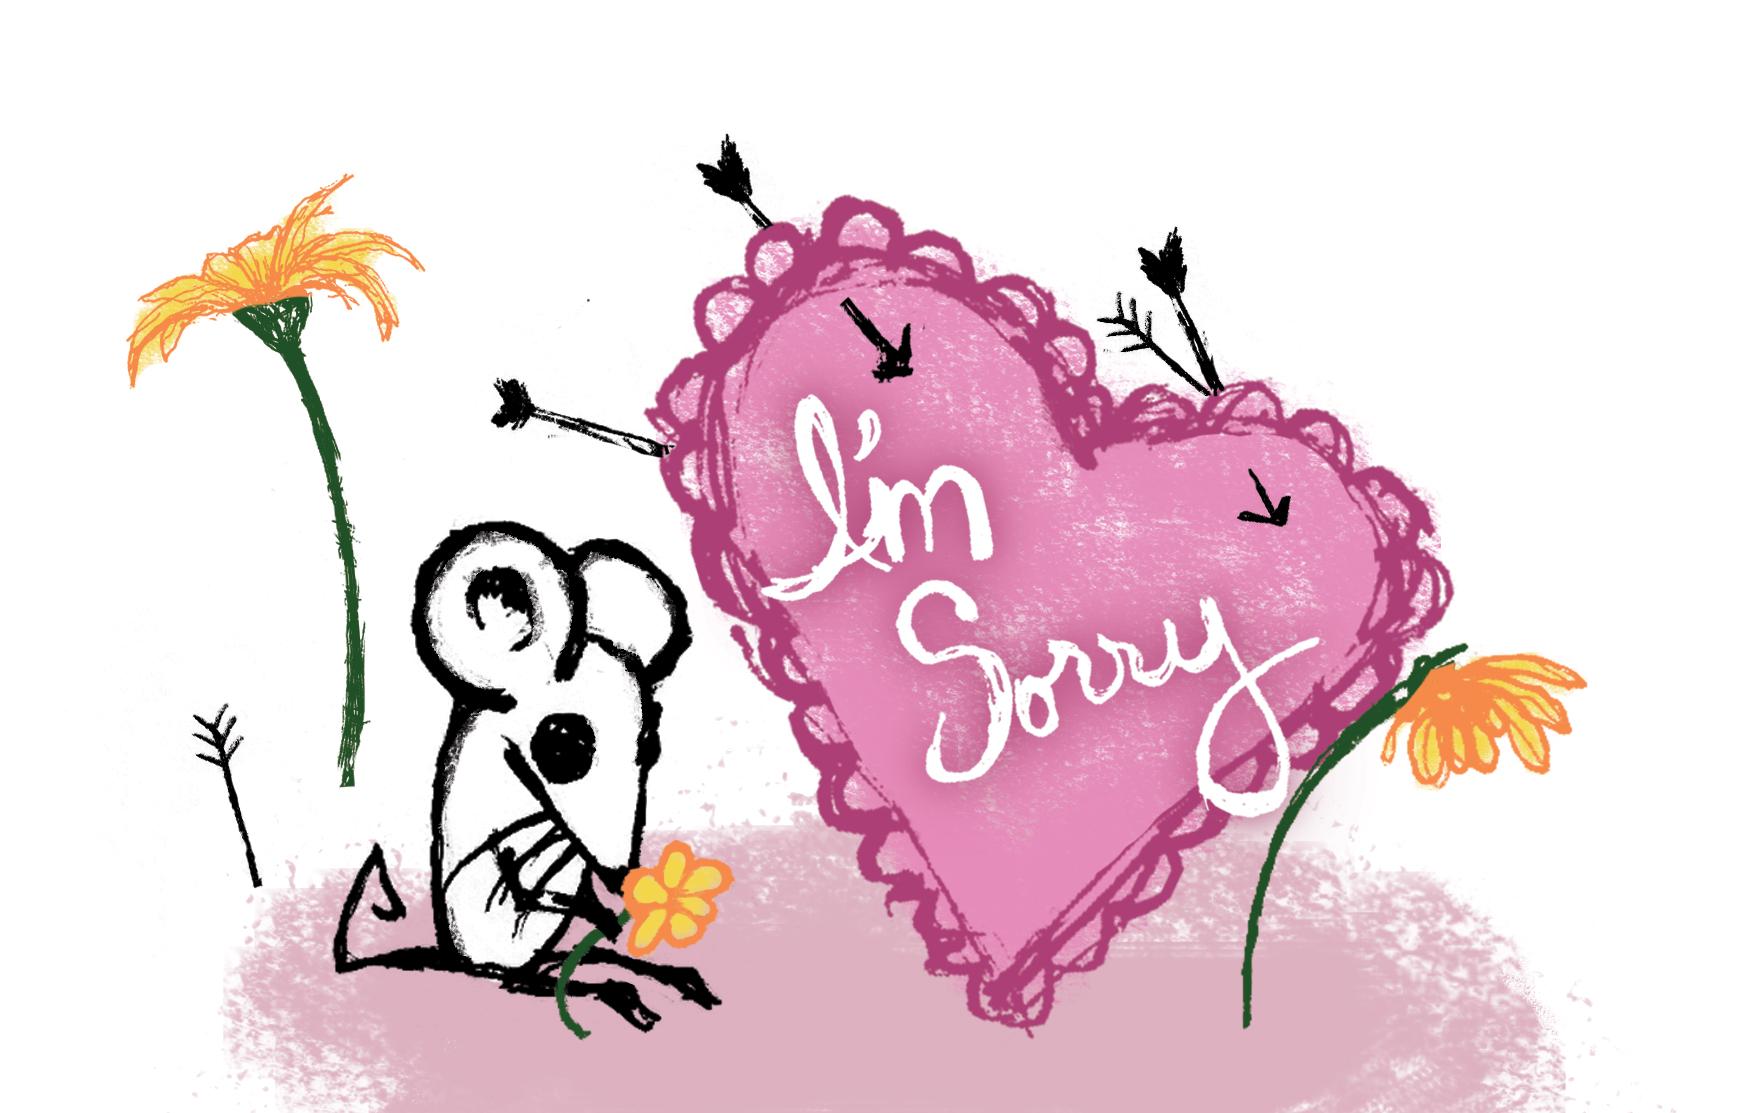 IM_SORRY_ART_ONLY.jpg